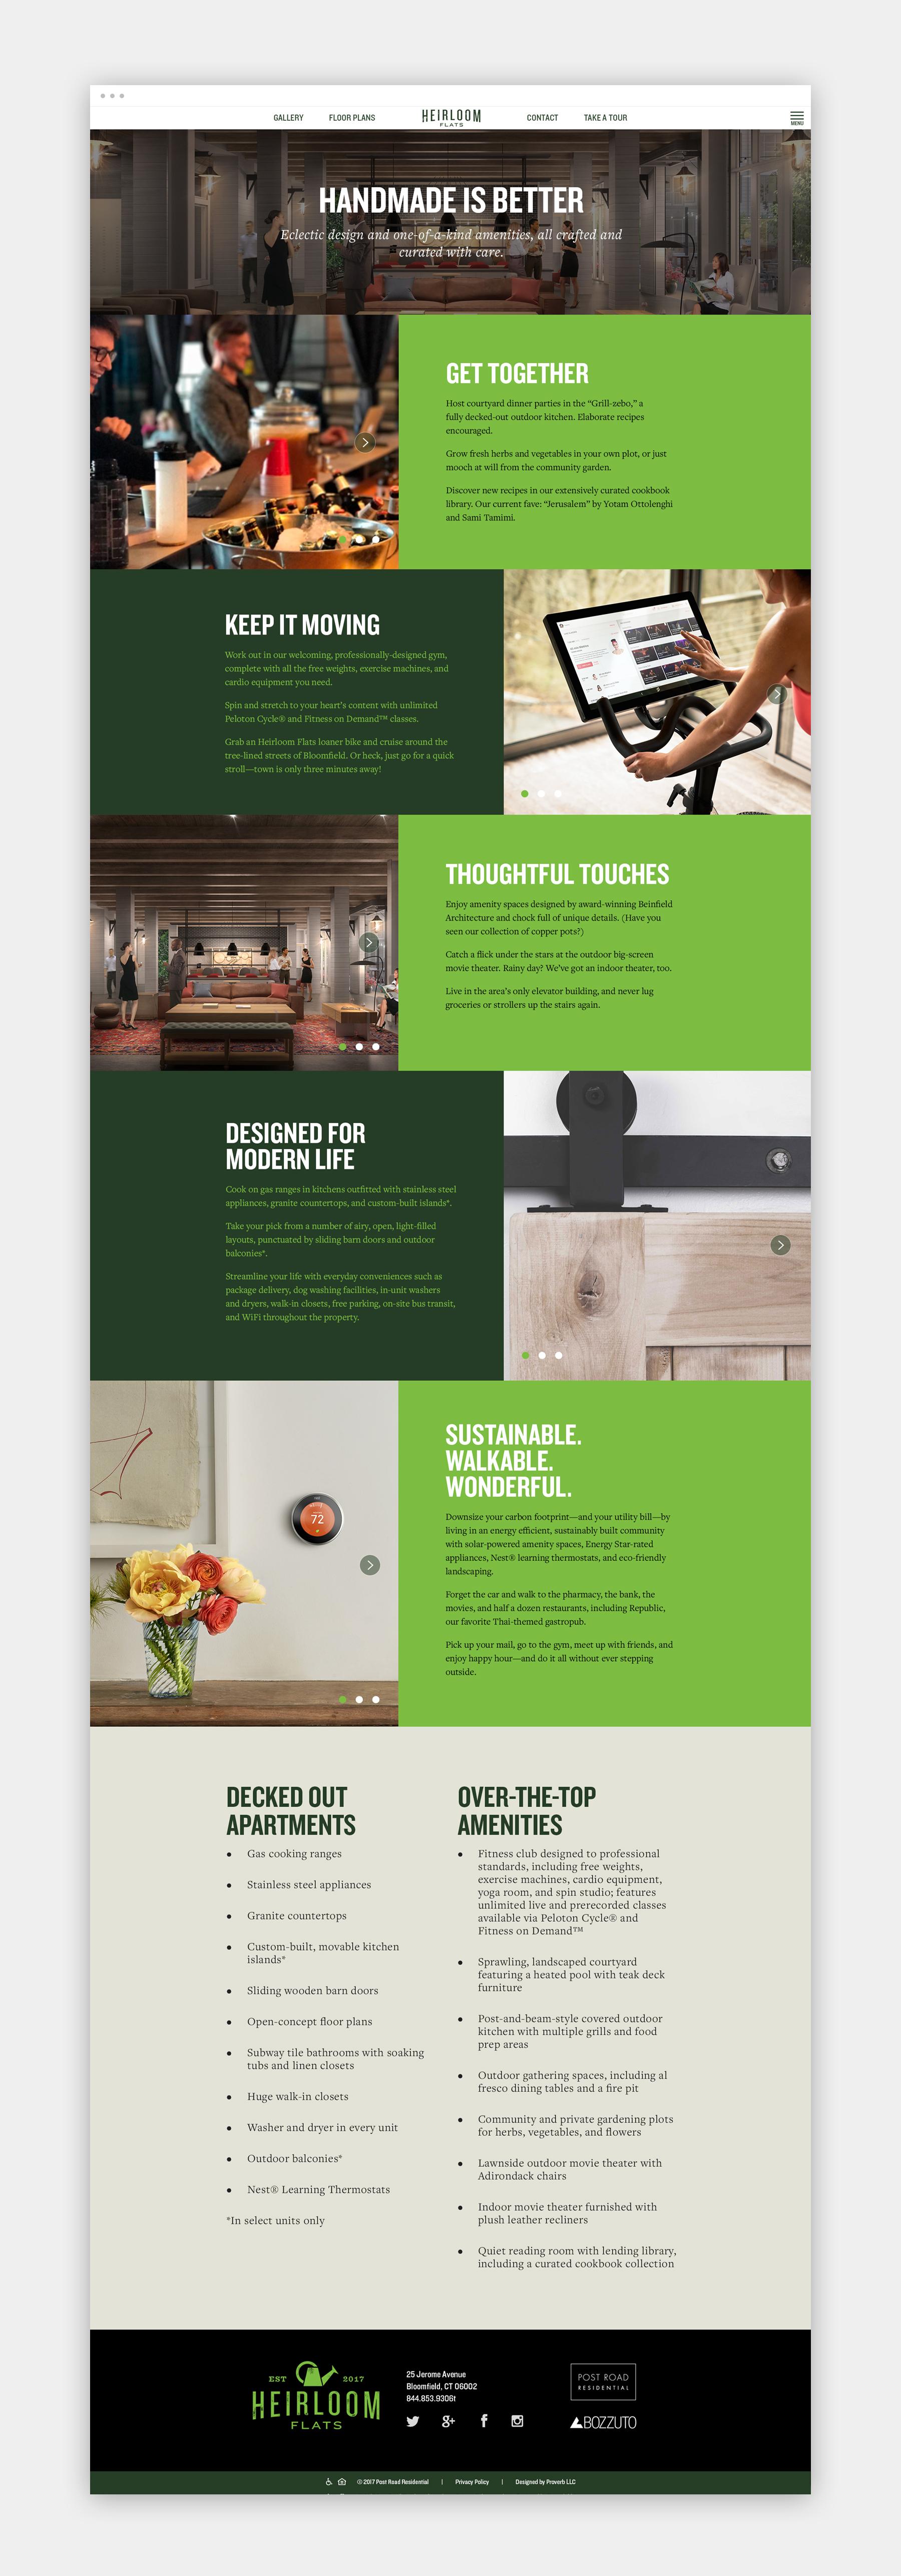 HeirloomFlats_design_amentities.jpg